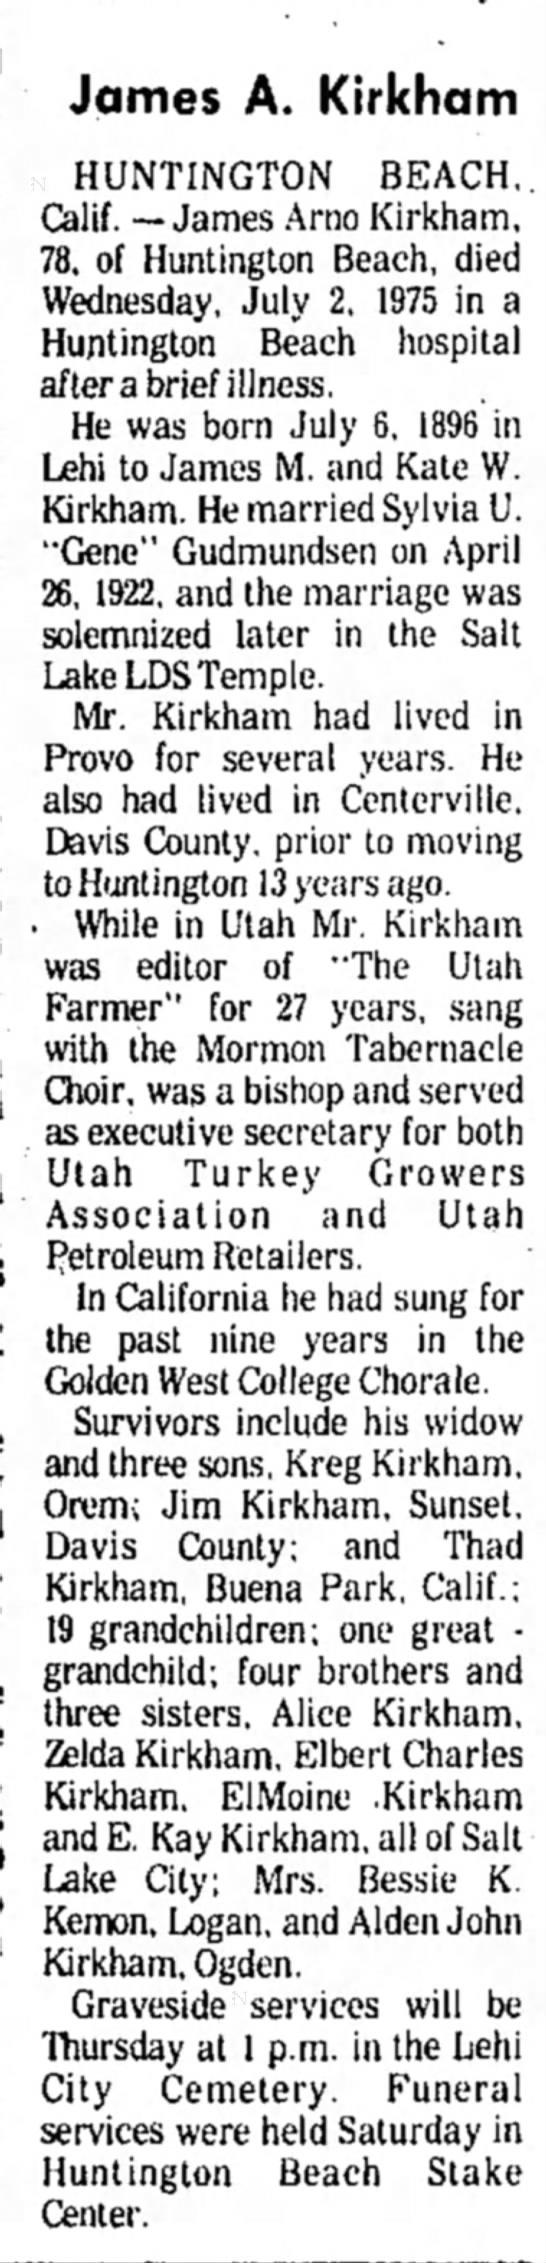 James A. Kirkham - brother of Elbert Charles Kirkham - obituary - Jqmes A. Kirkham HUNTINGTON BEACH, Calif....